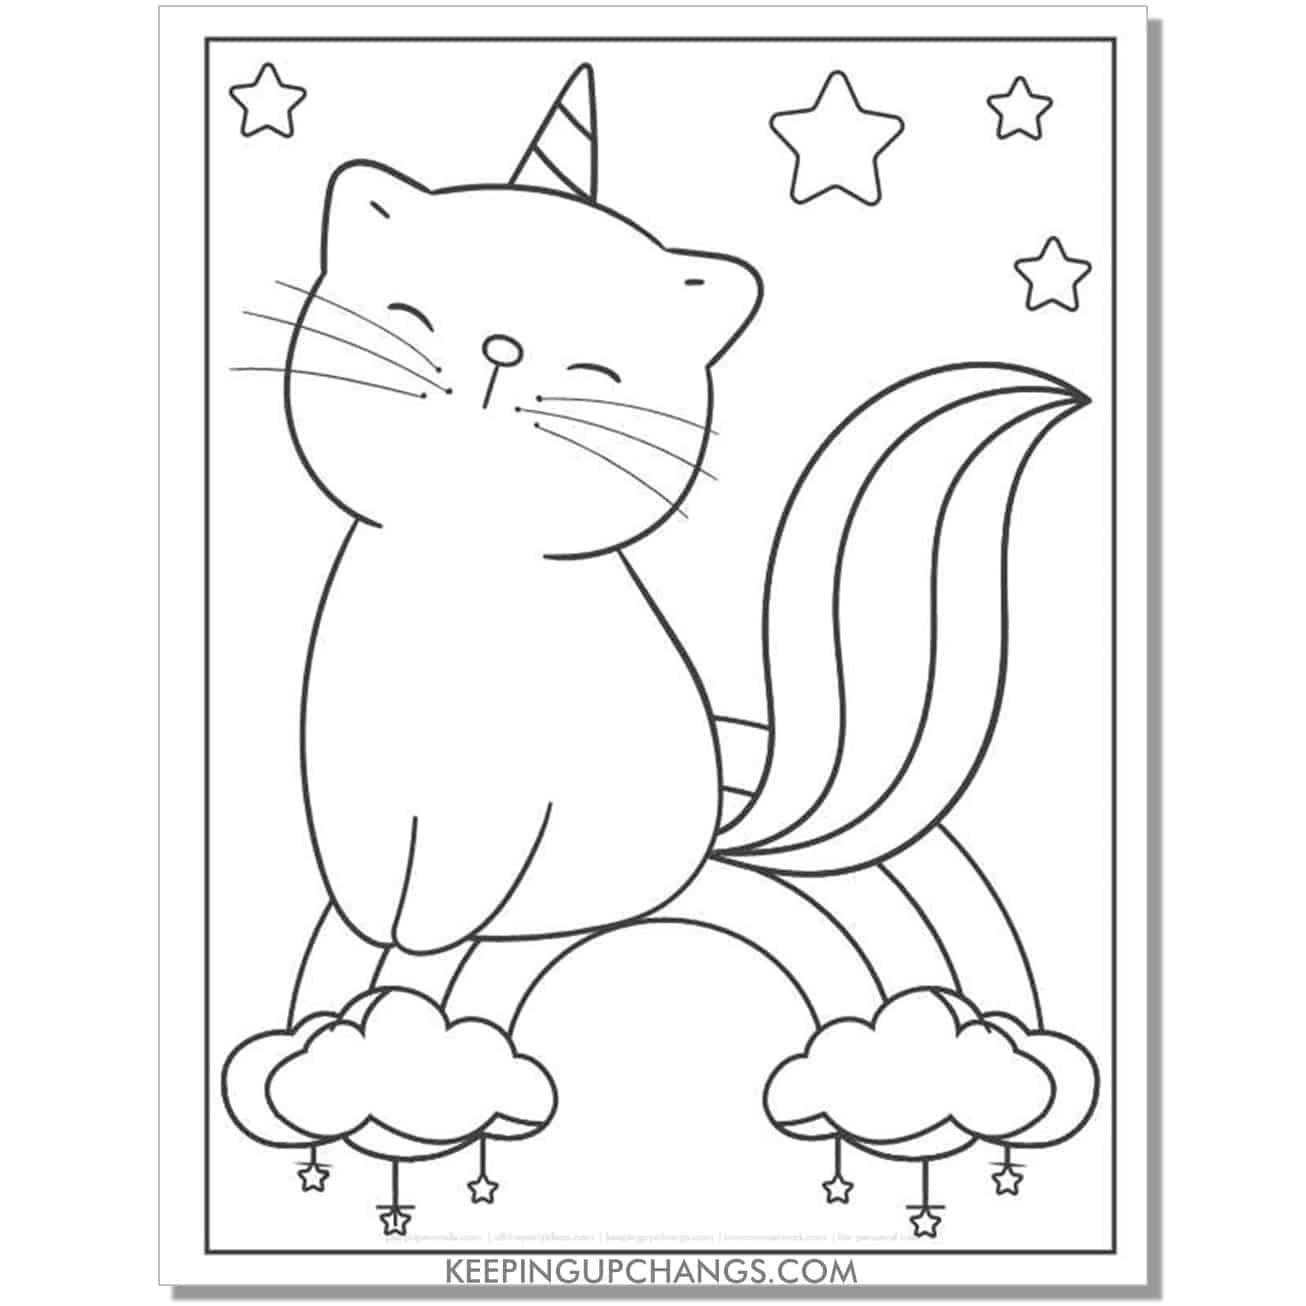 cat unicorn sitting on rainbow coloring page.